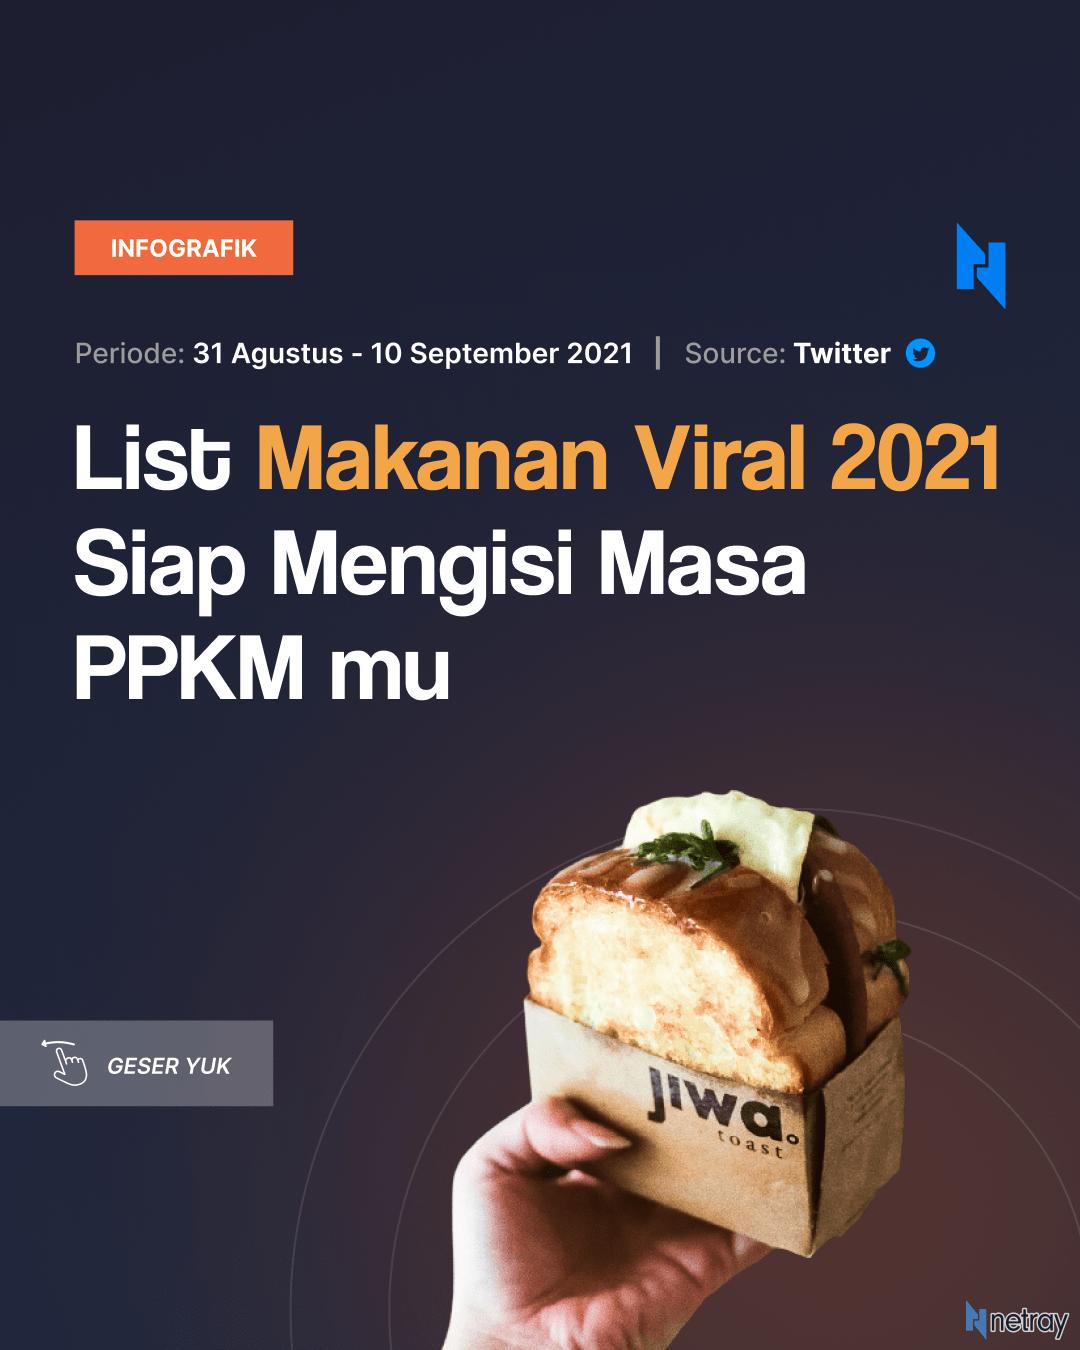 List Makanan Viral 2021 Siap Mengisi Masa PPKM mu